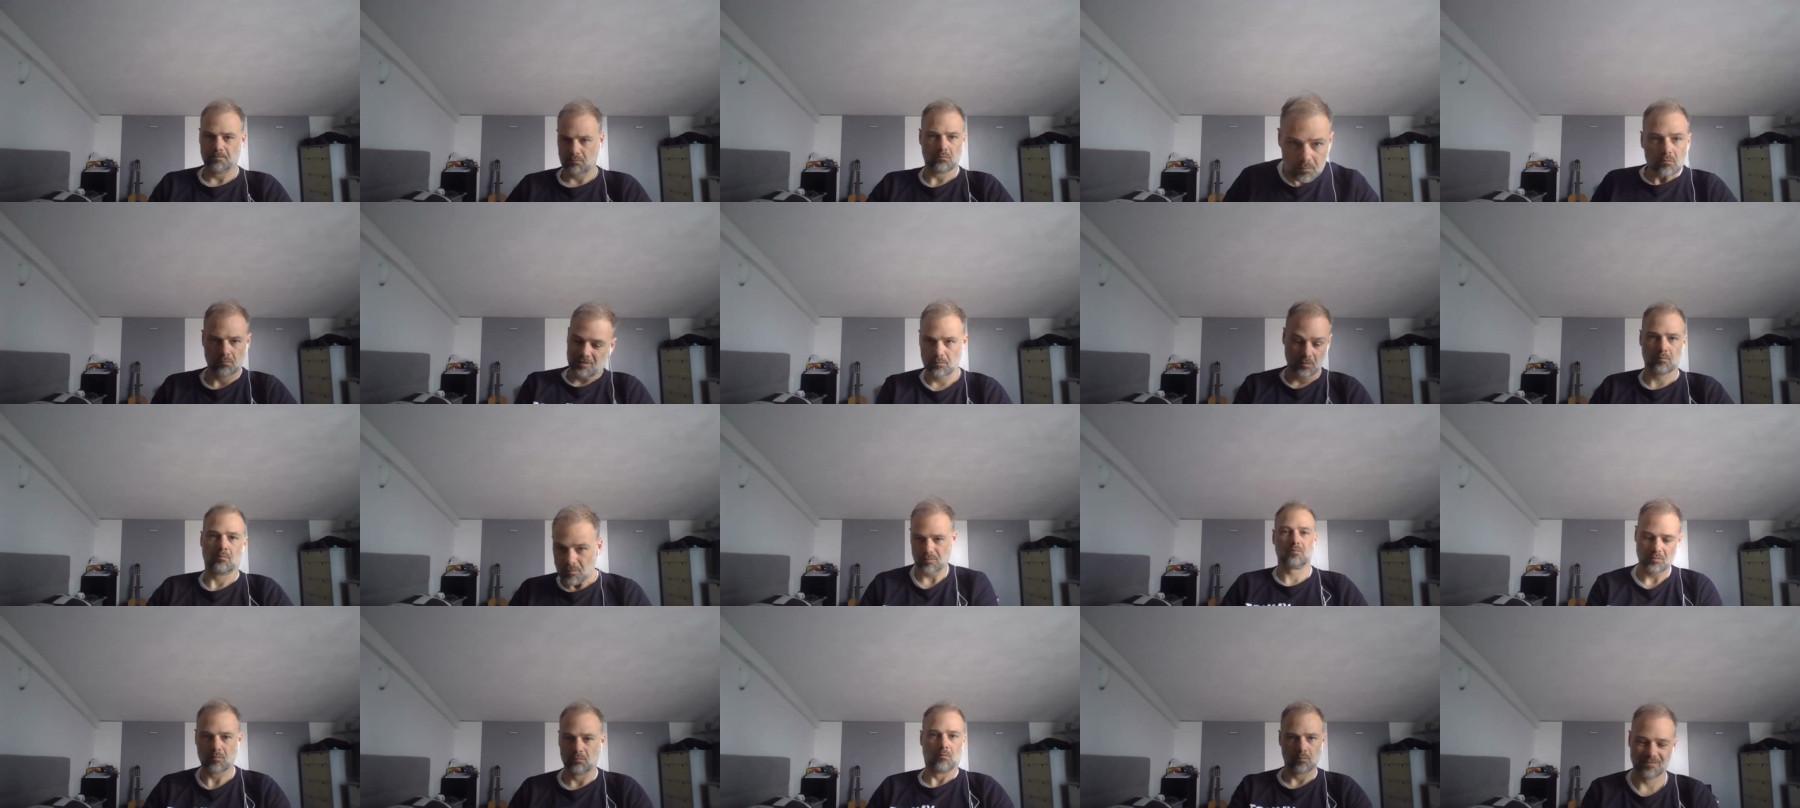 Easyrider2021 Cam4 11-05-2021 Recorded Video Webcam